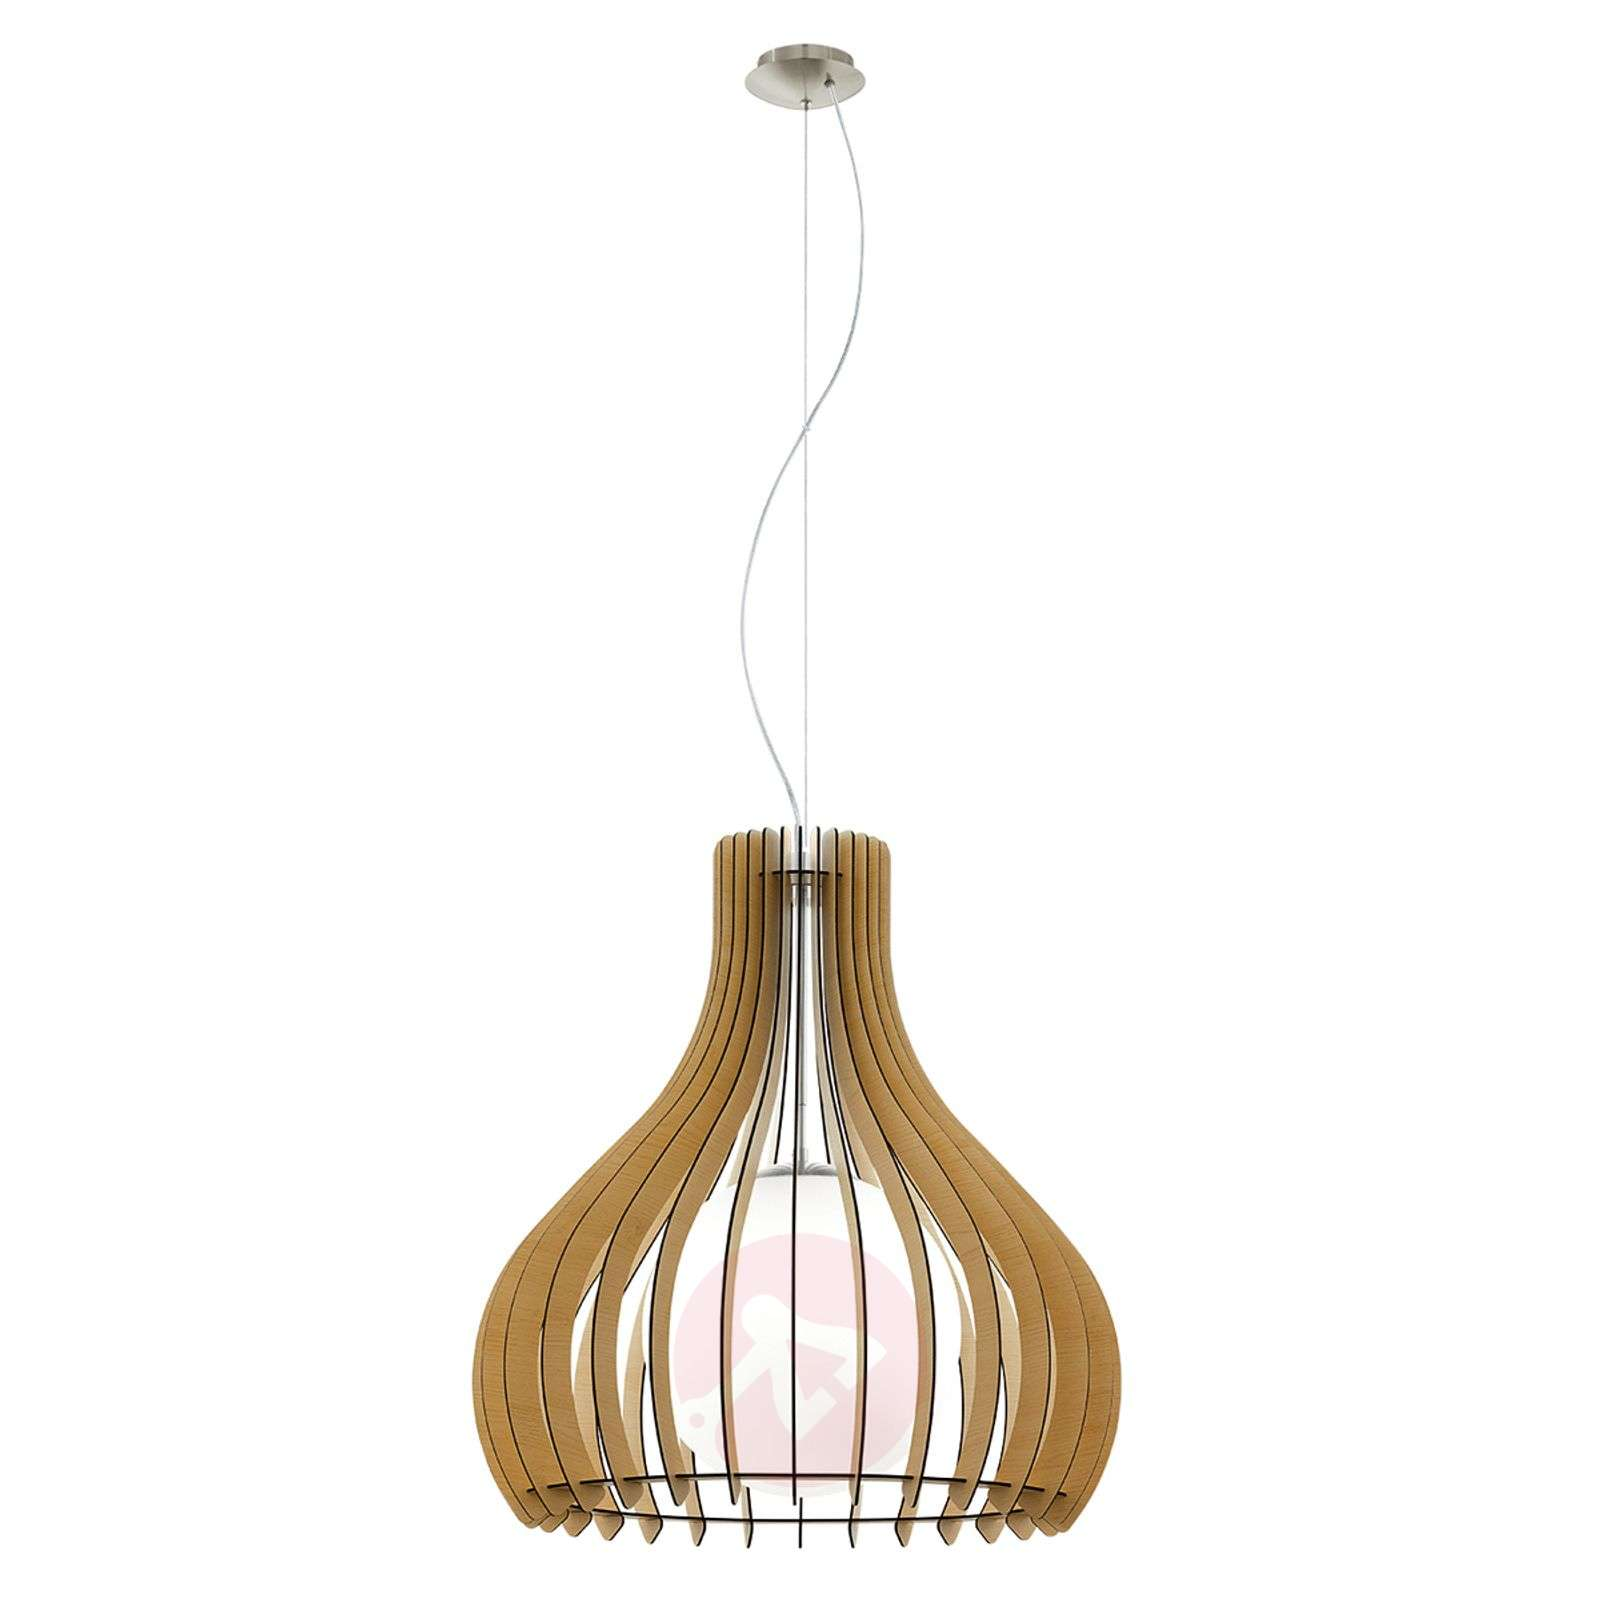 Tindori attractively designed pendant light-3031822-01